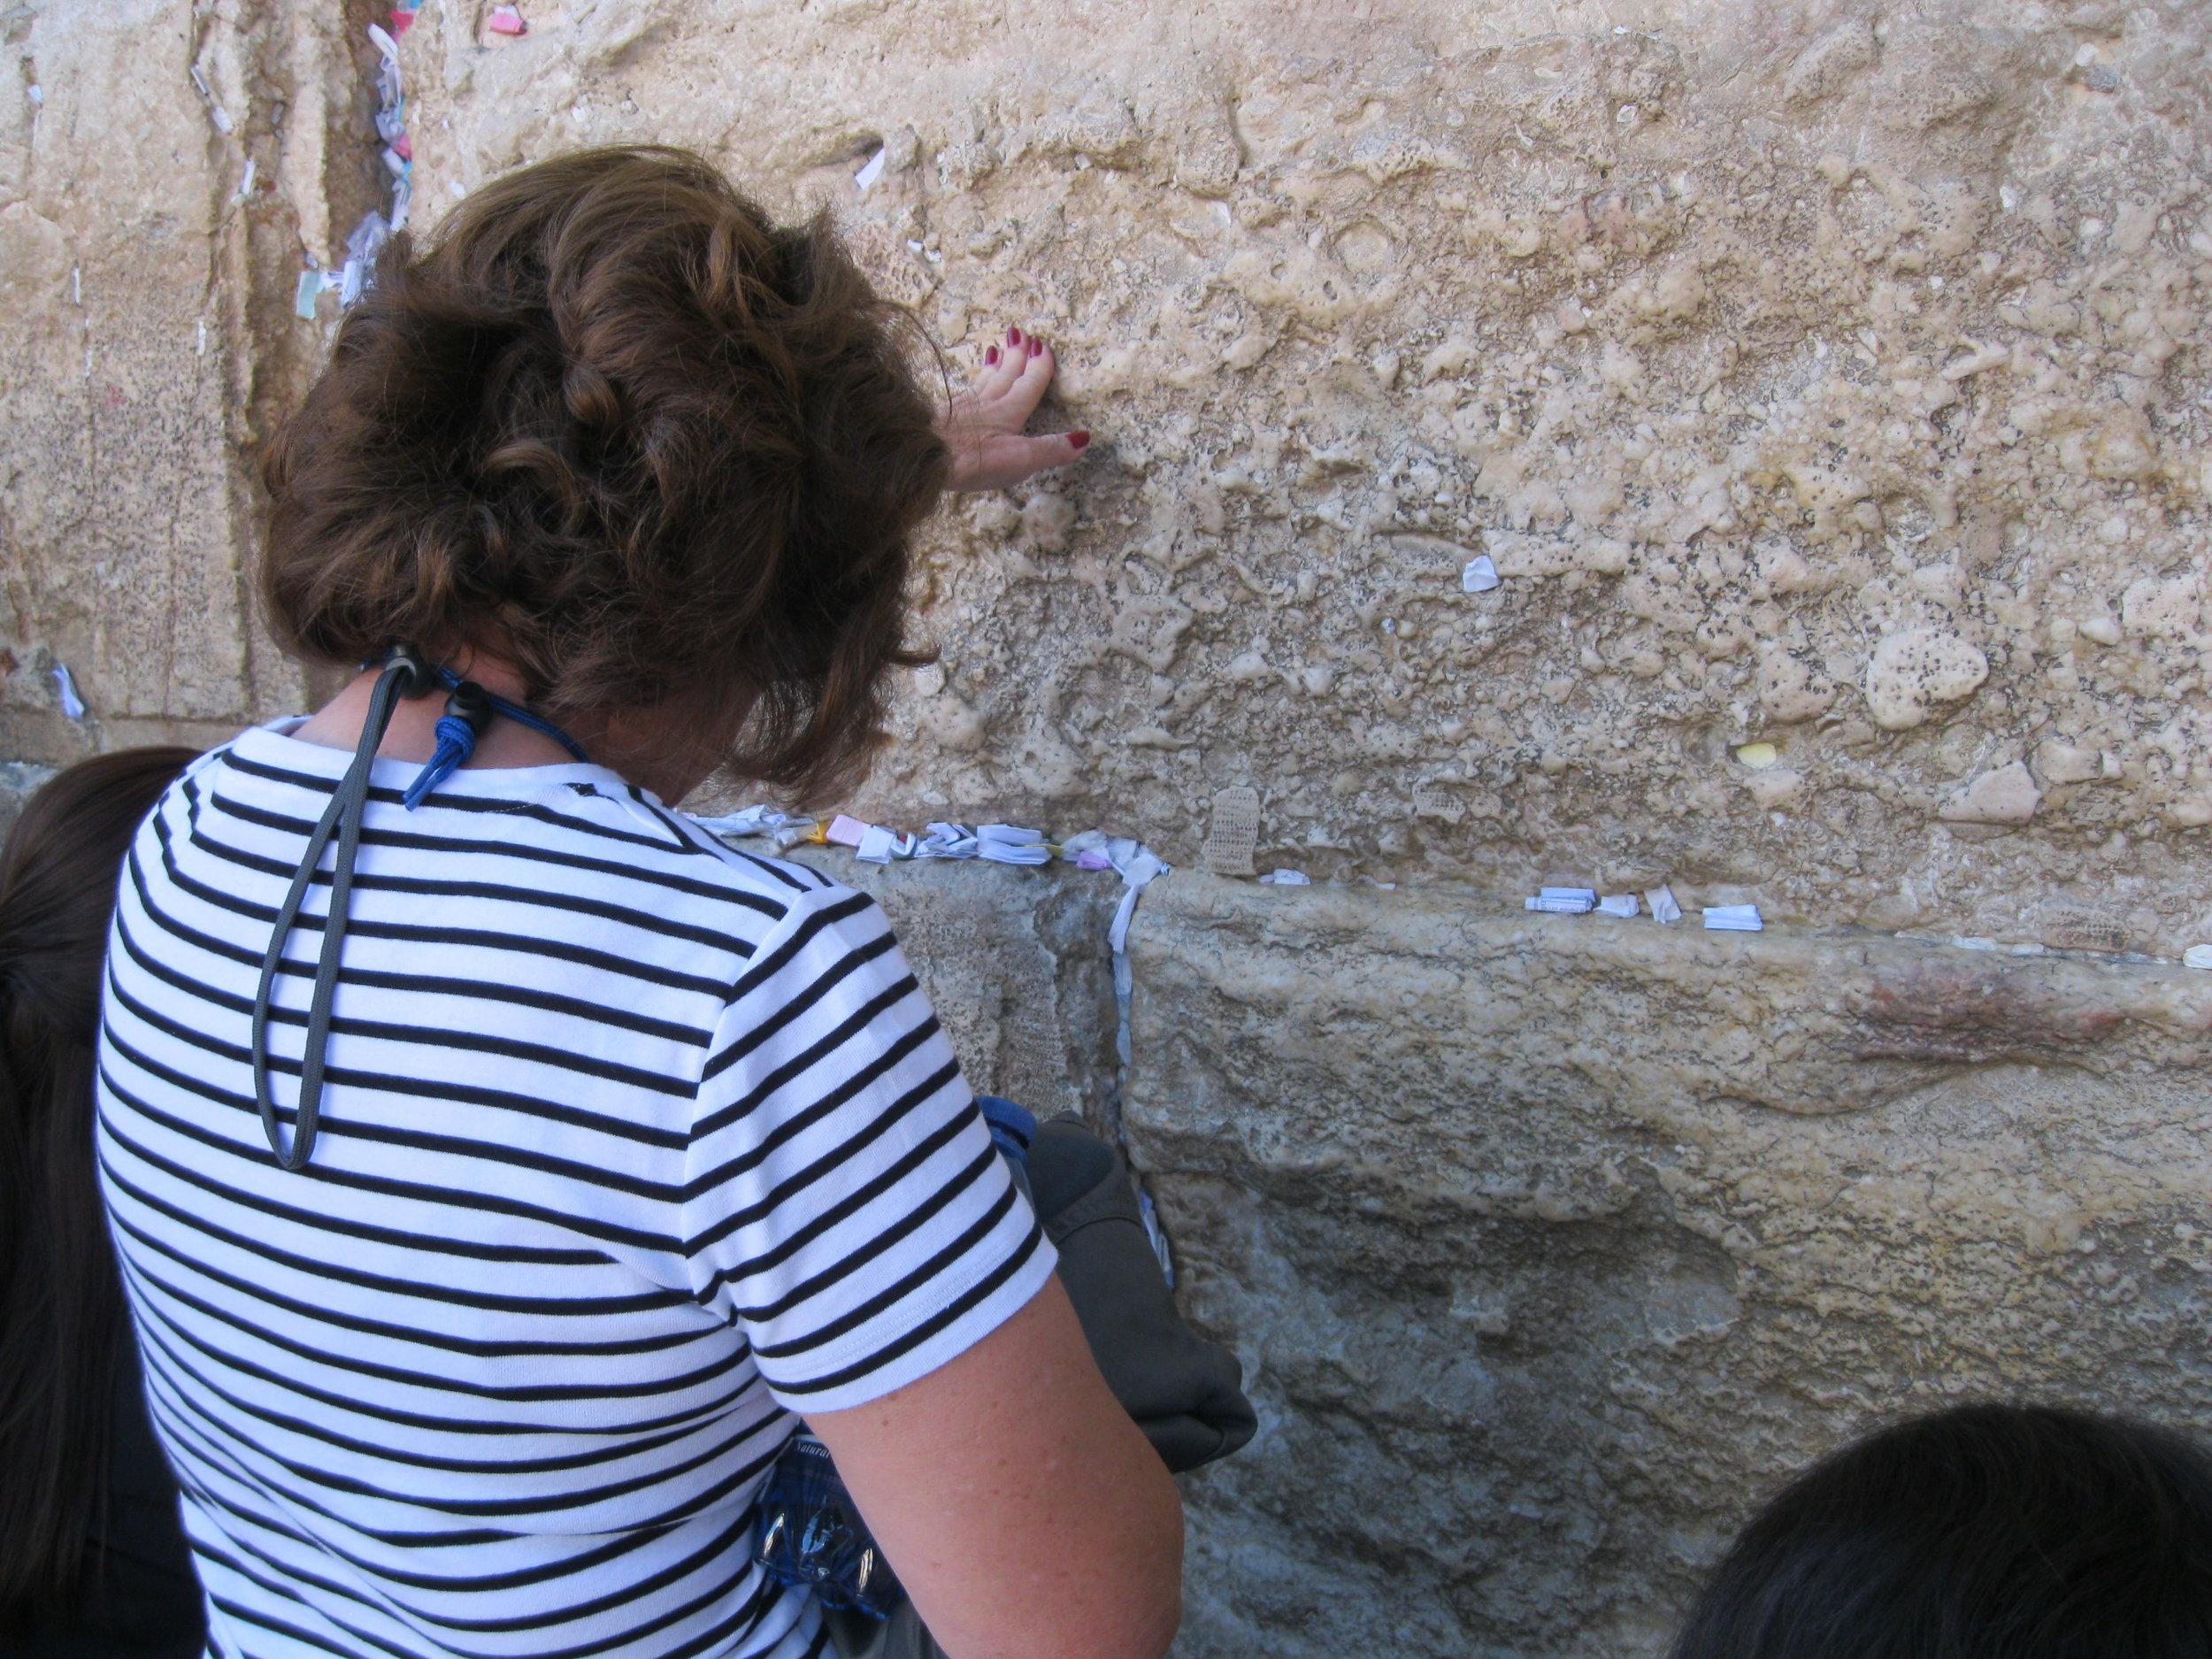 Western Wall Prayers - Israel Tour 2013